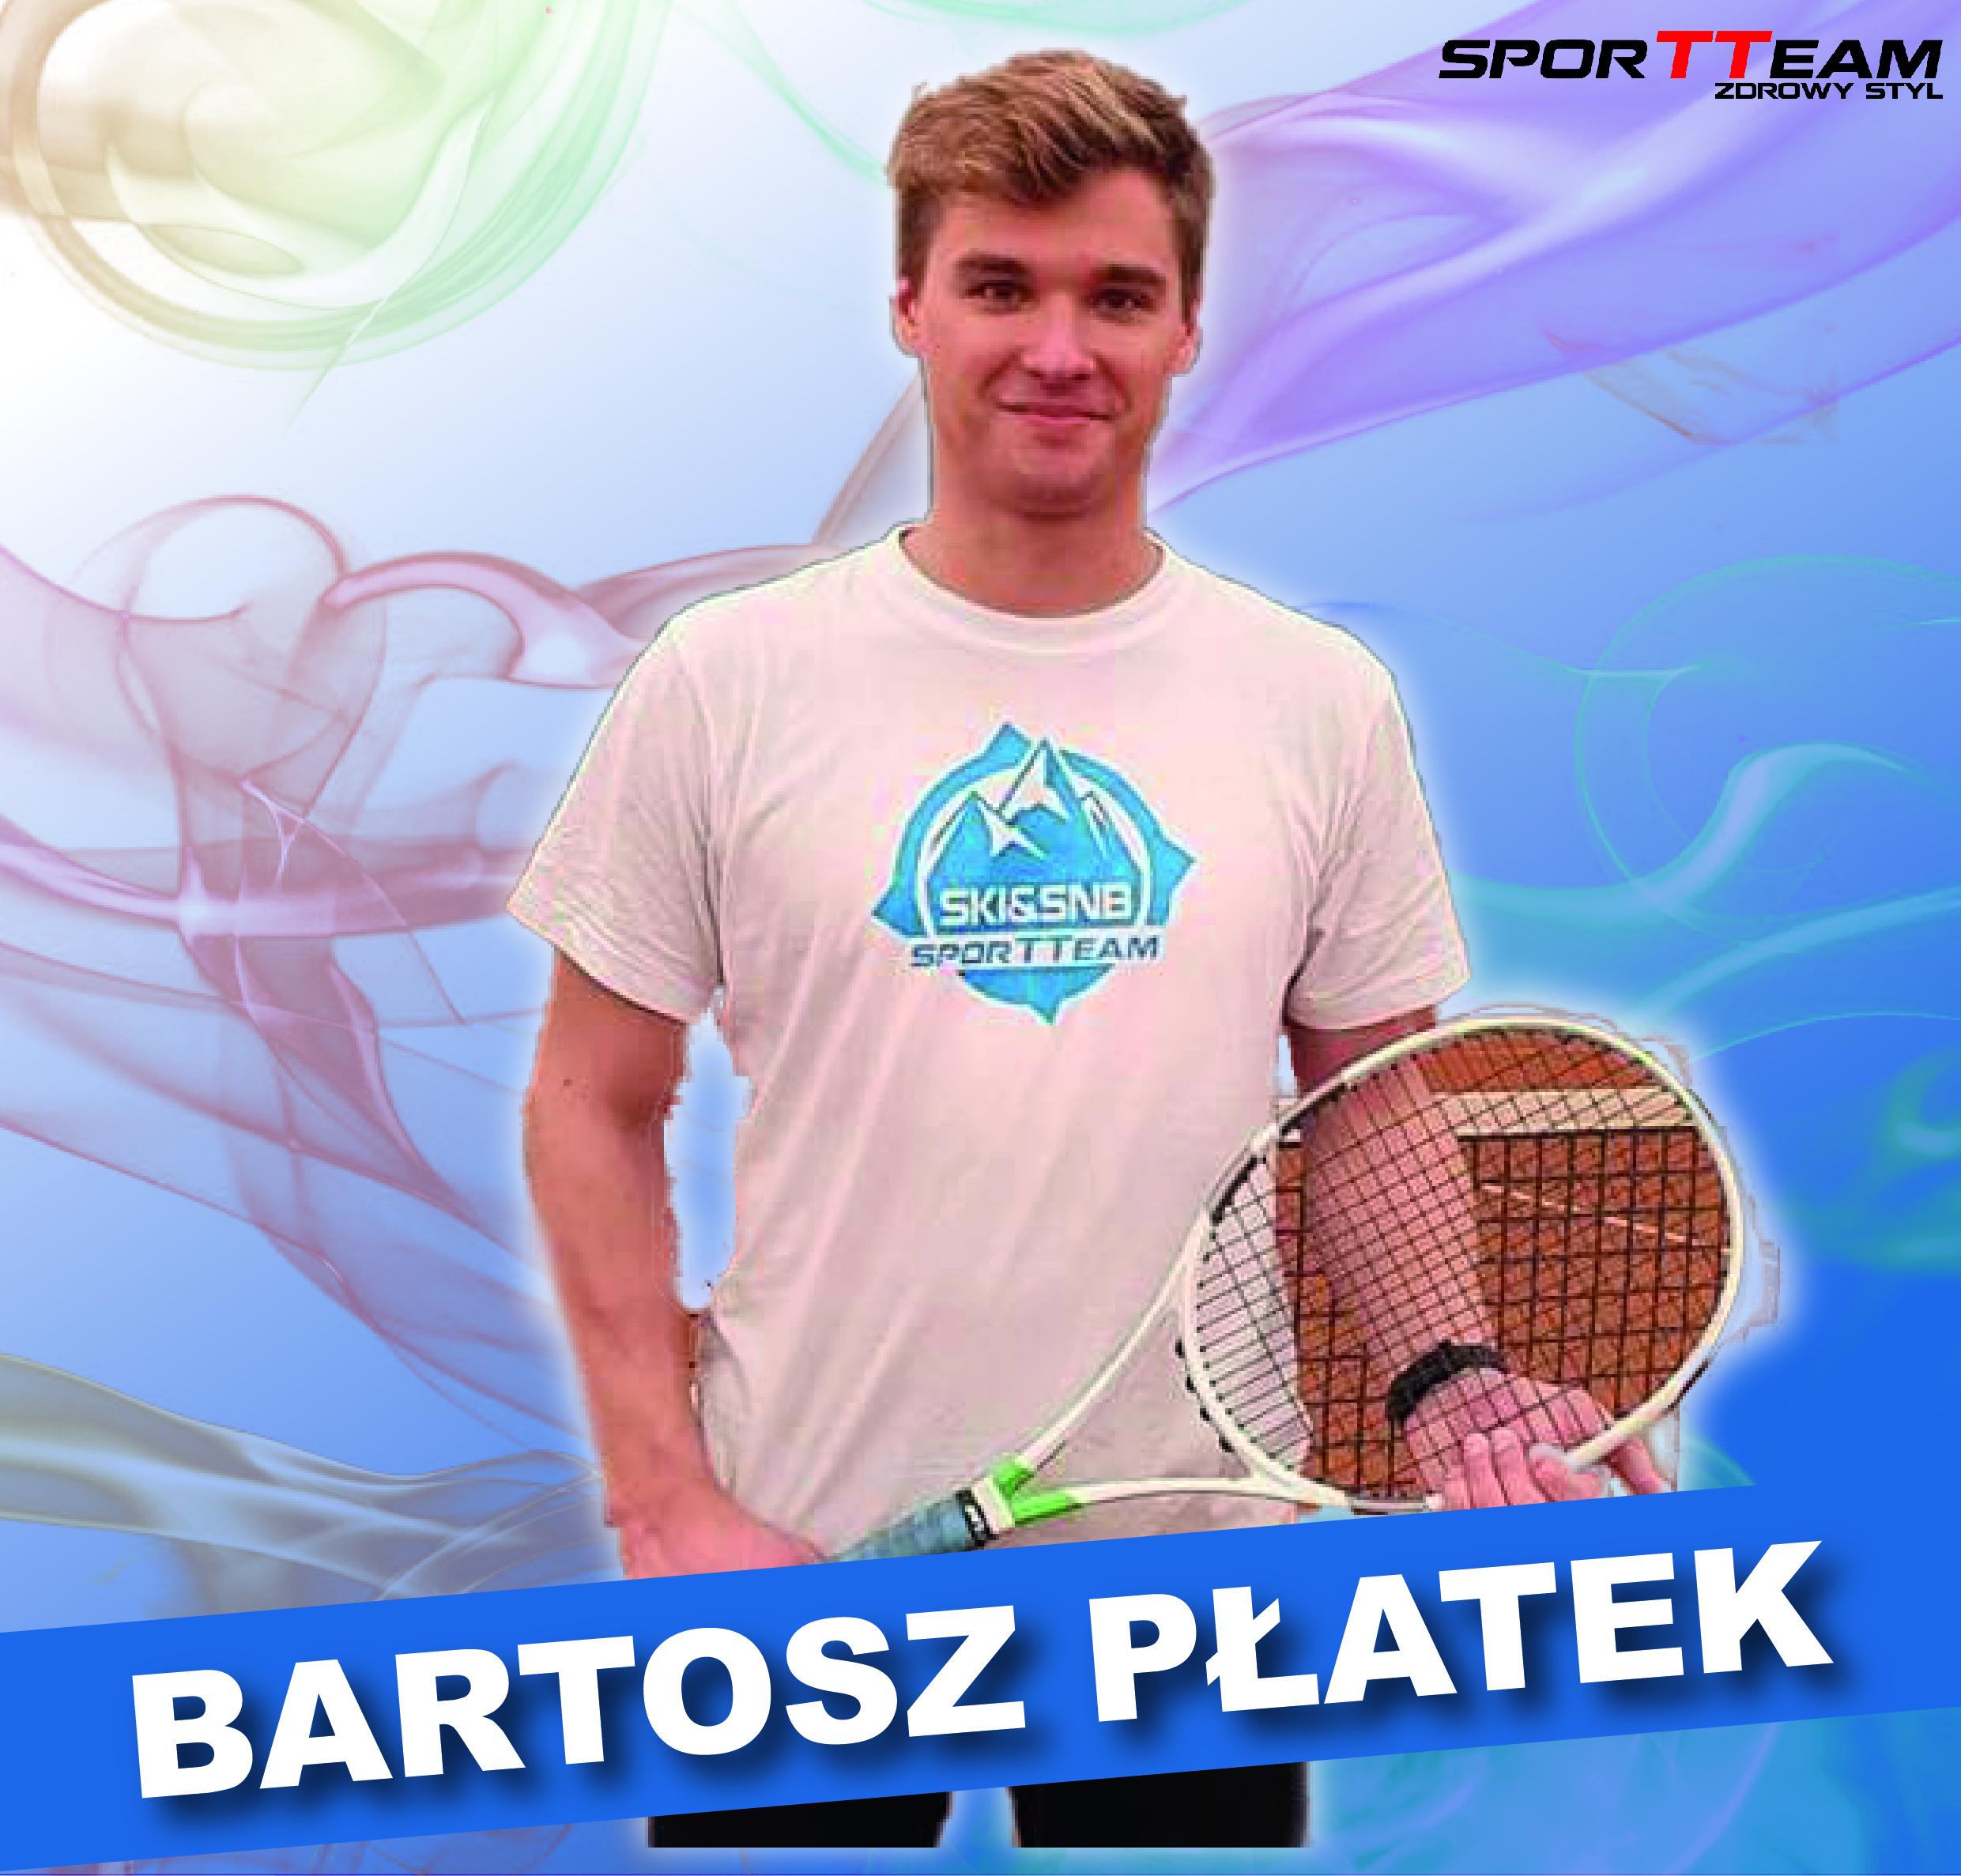 Bartosz